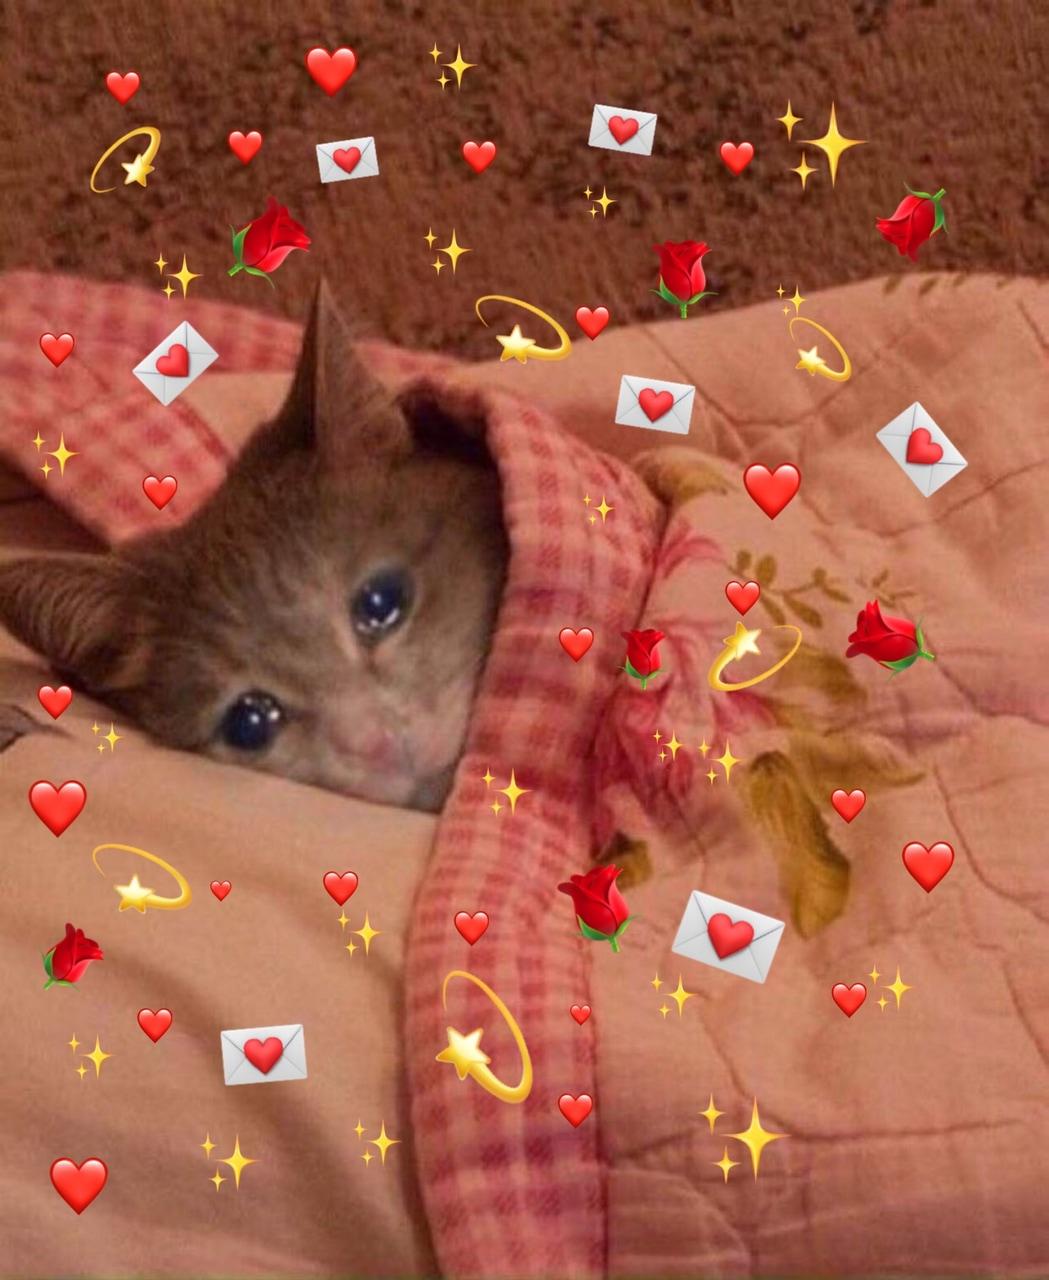 Cat Hearts Meme : hearts, Lover, Uploaded, Gallaghearts, Heart